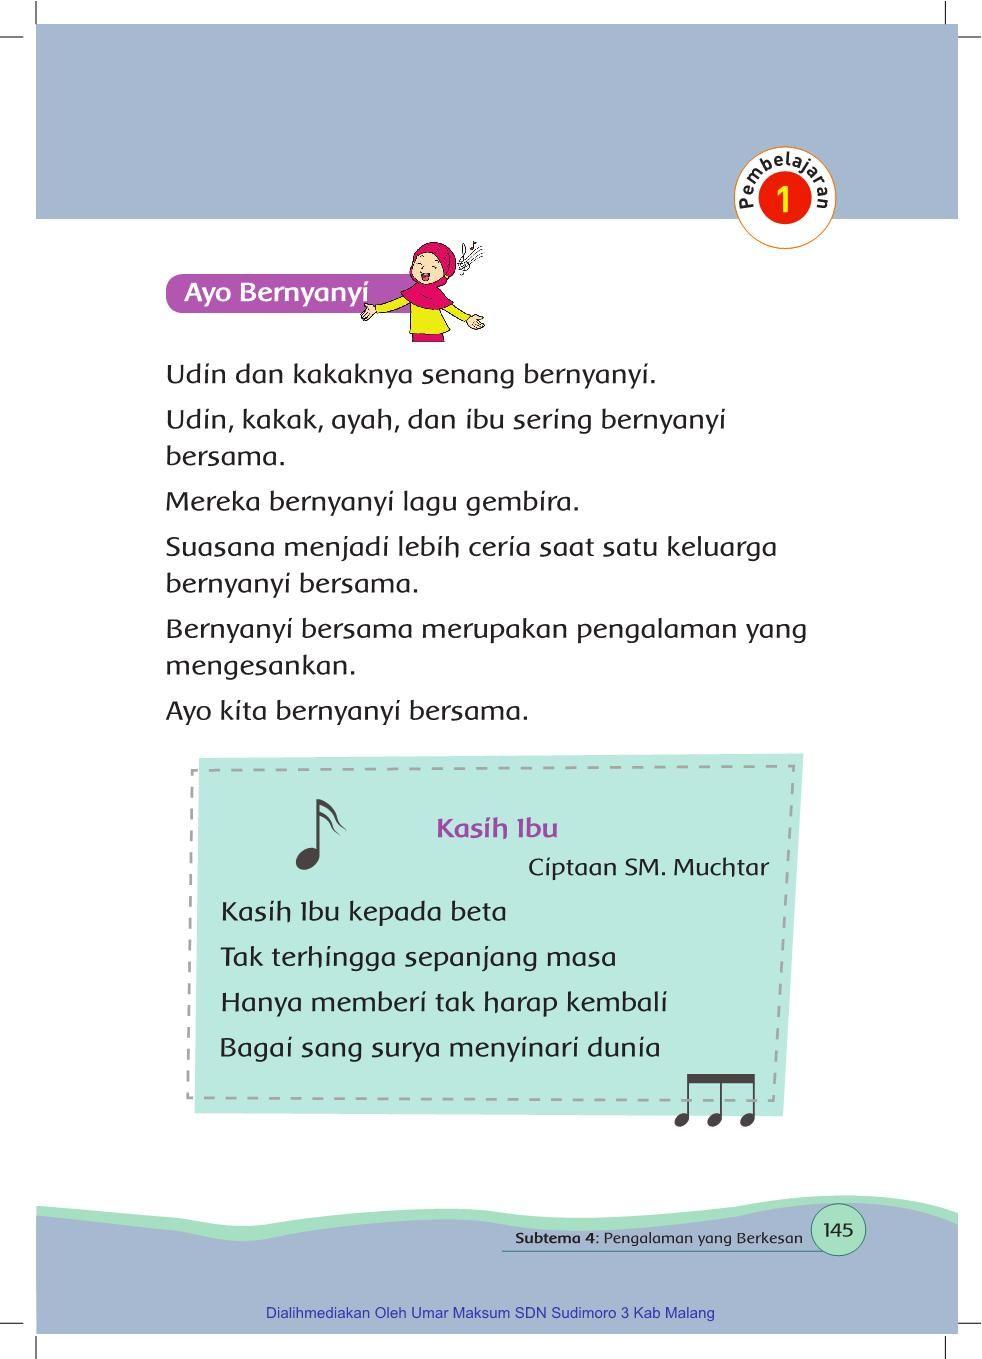 Free Download lagu Hujan Rintik-Rintik & Tik Tik Bunyi Hujan terbaru